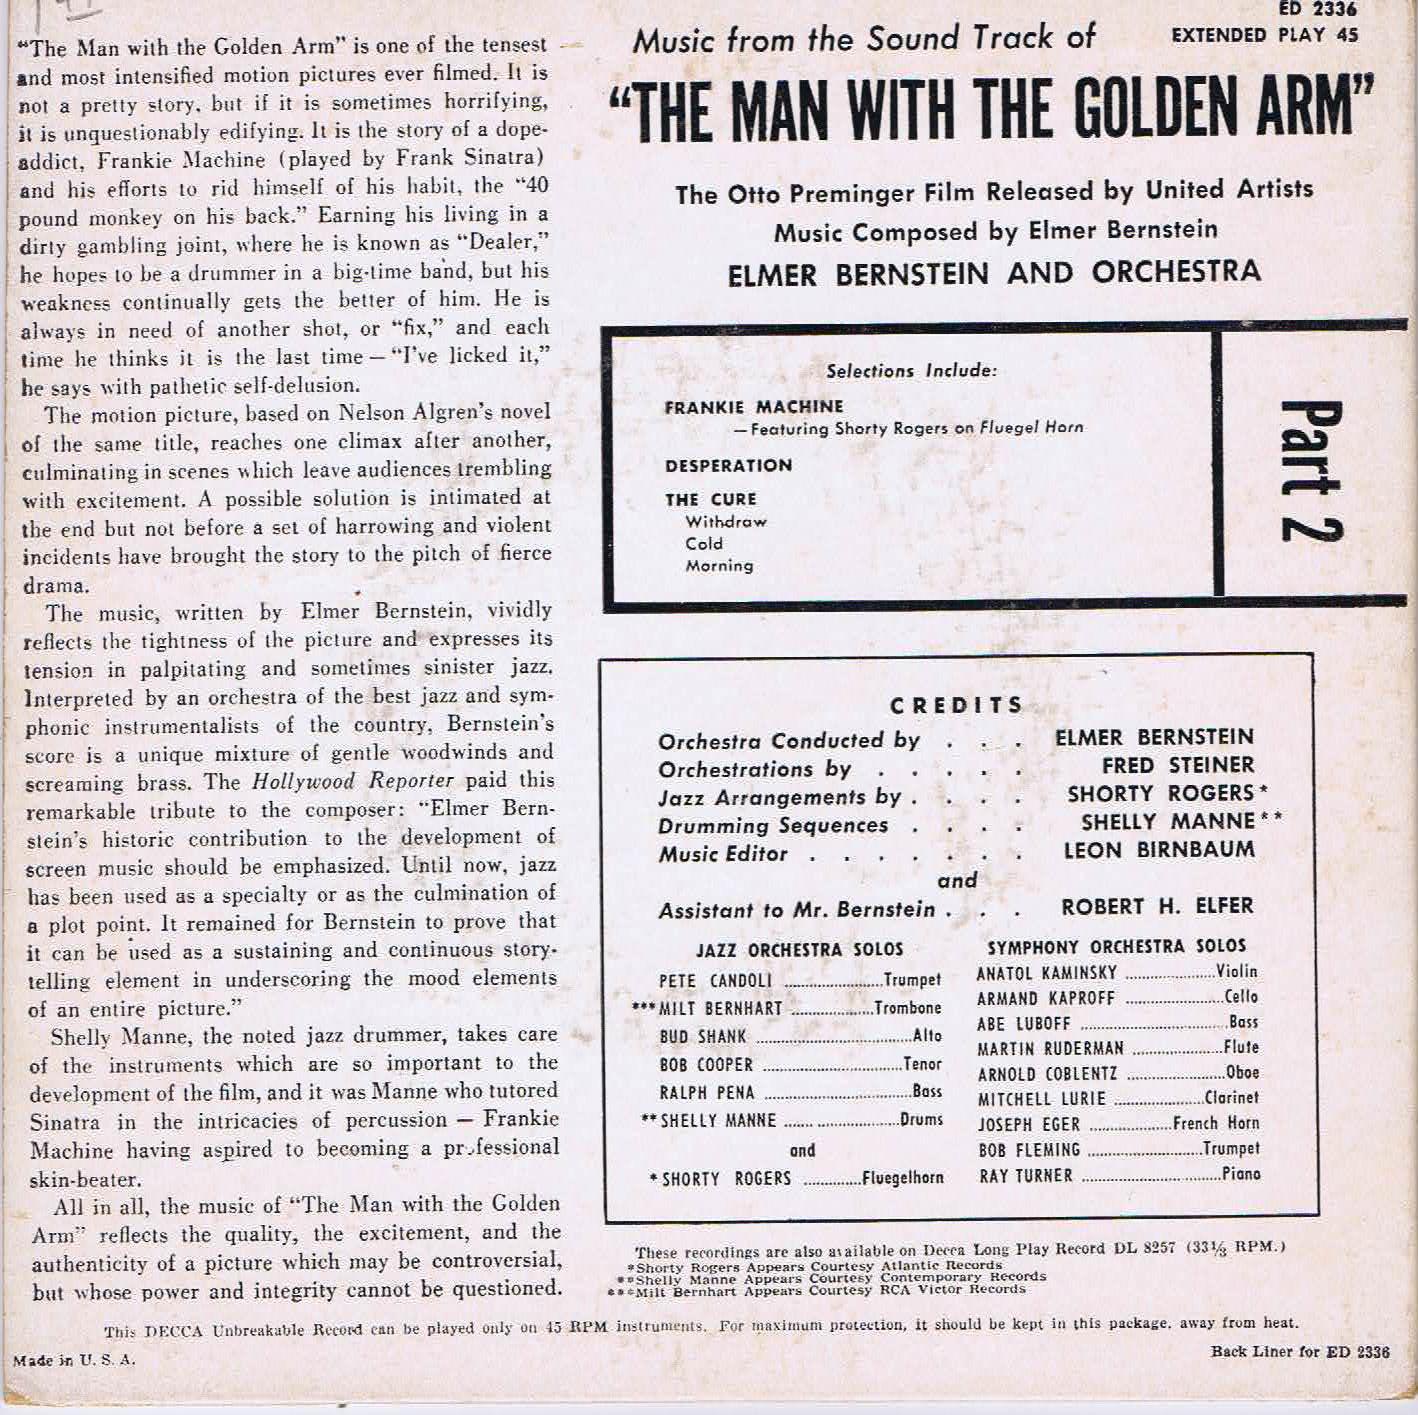 Elmer Bernstein - The Man With The Golden Arm - 3-EP Set - ED 2335, 2336,  2337